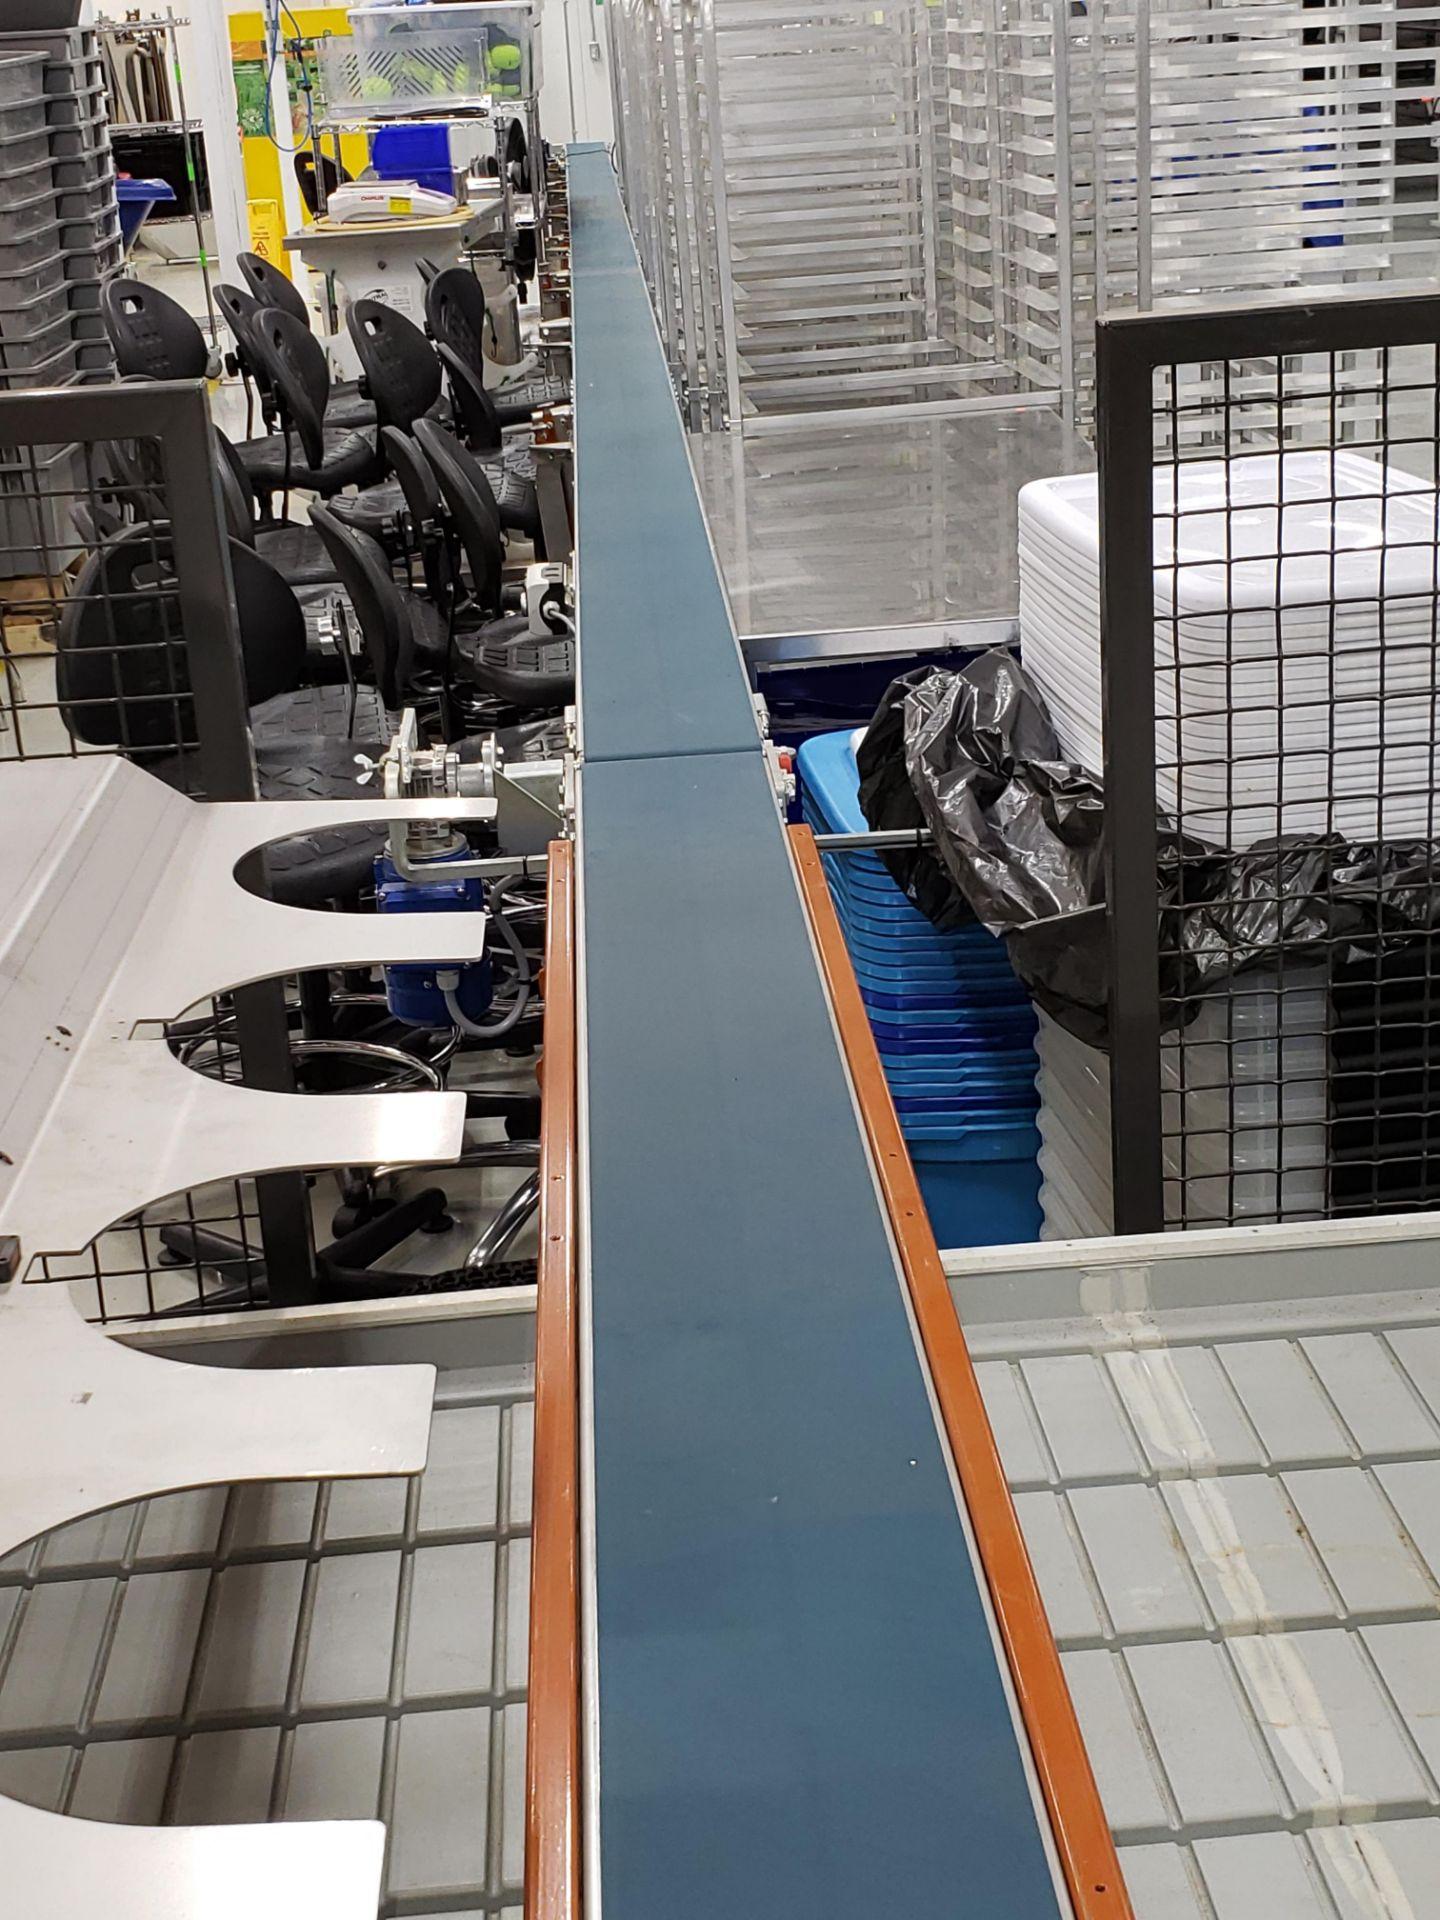 Lot 16 - Javo Conveyor System Model CS-18, Serial number 26800037